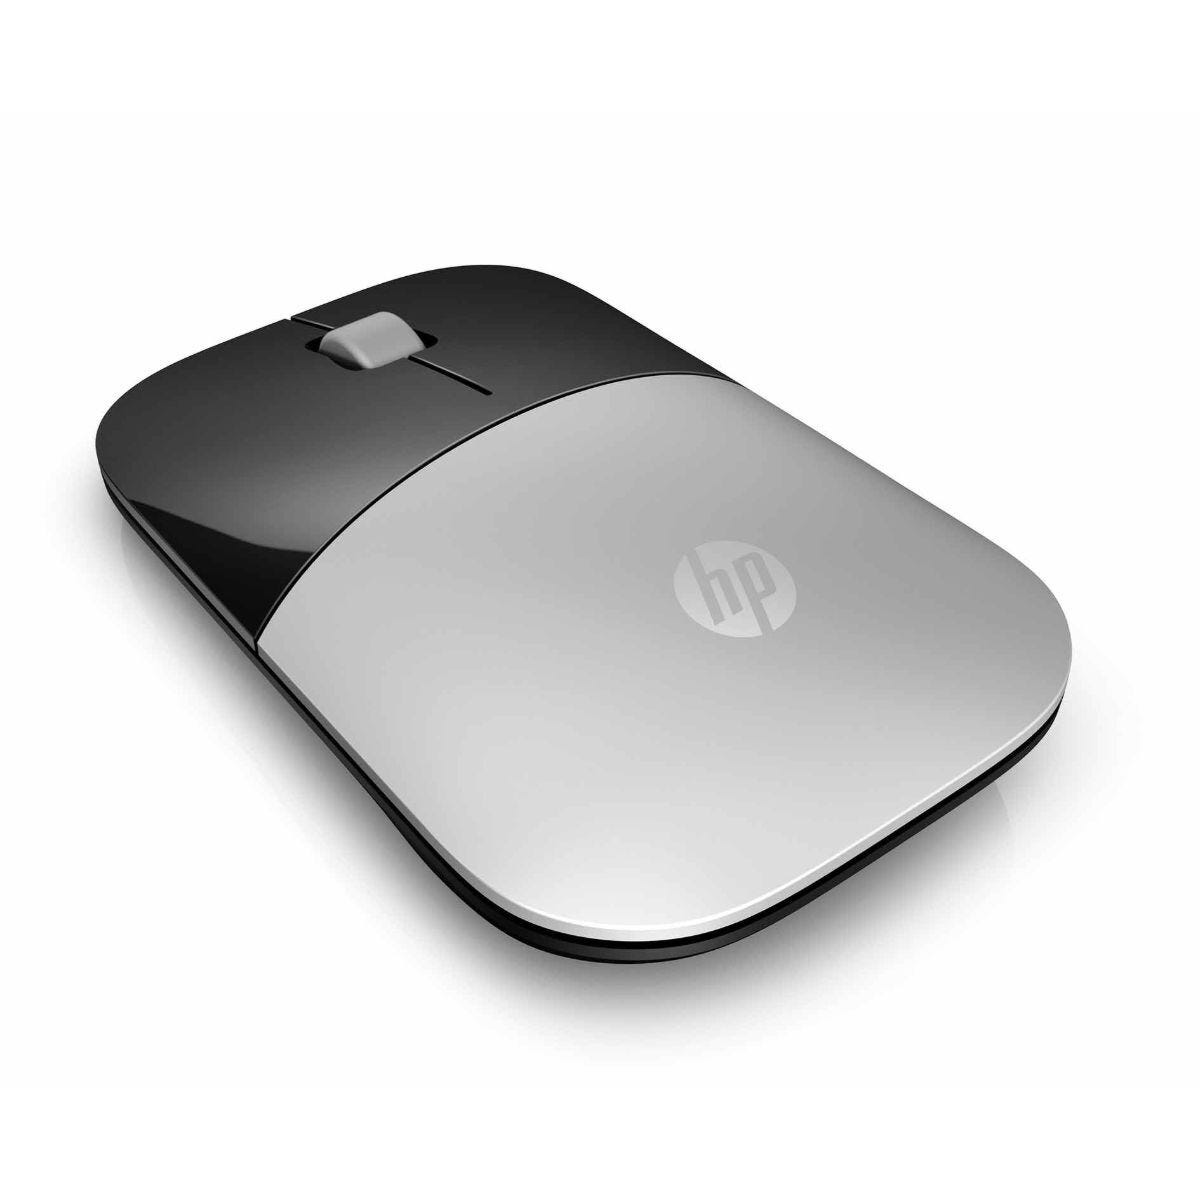 HP Z3700 Wireless LED Mouse